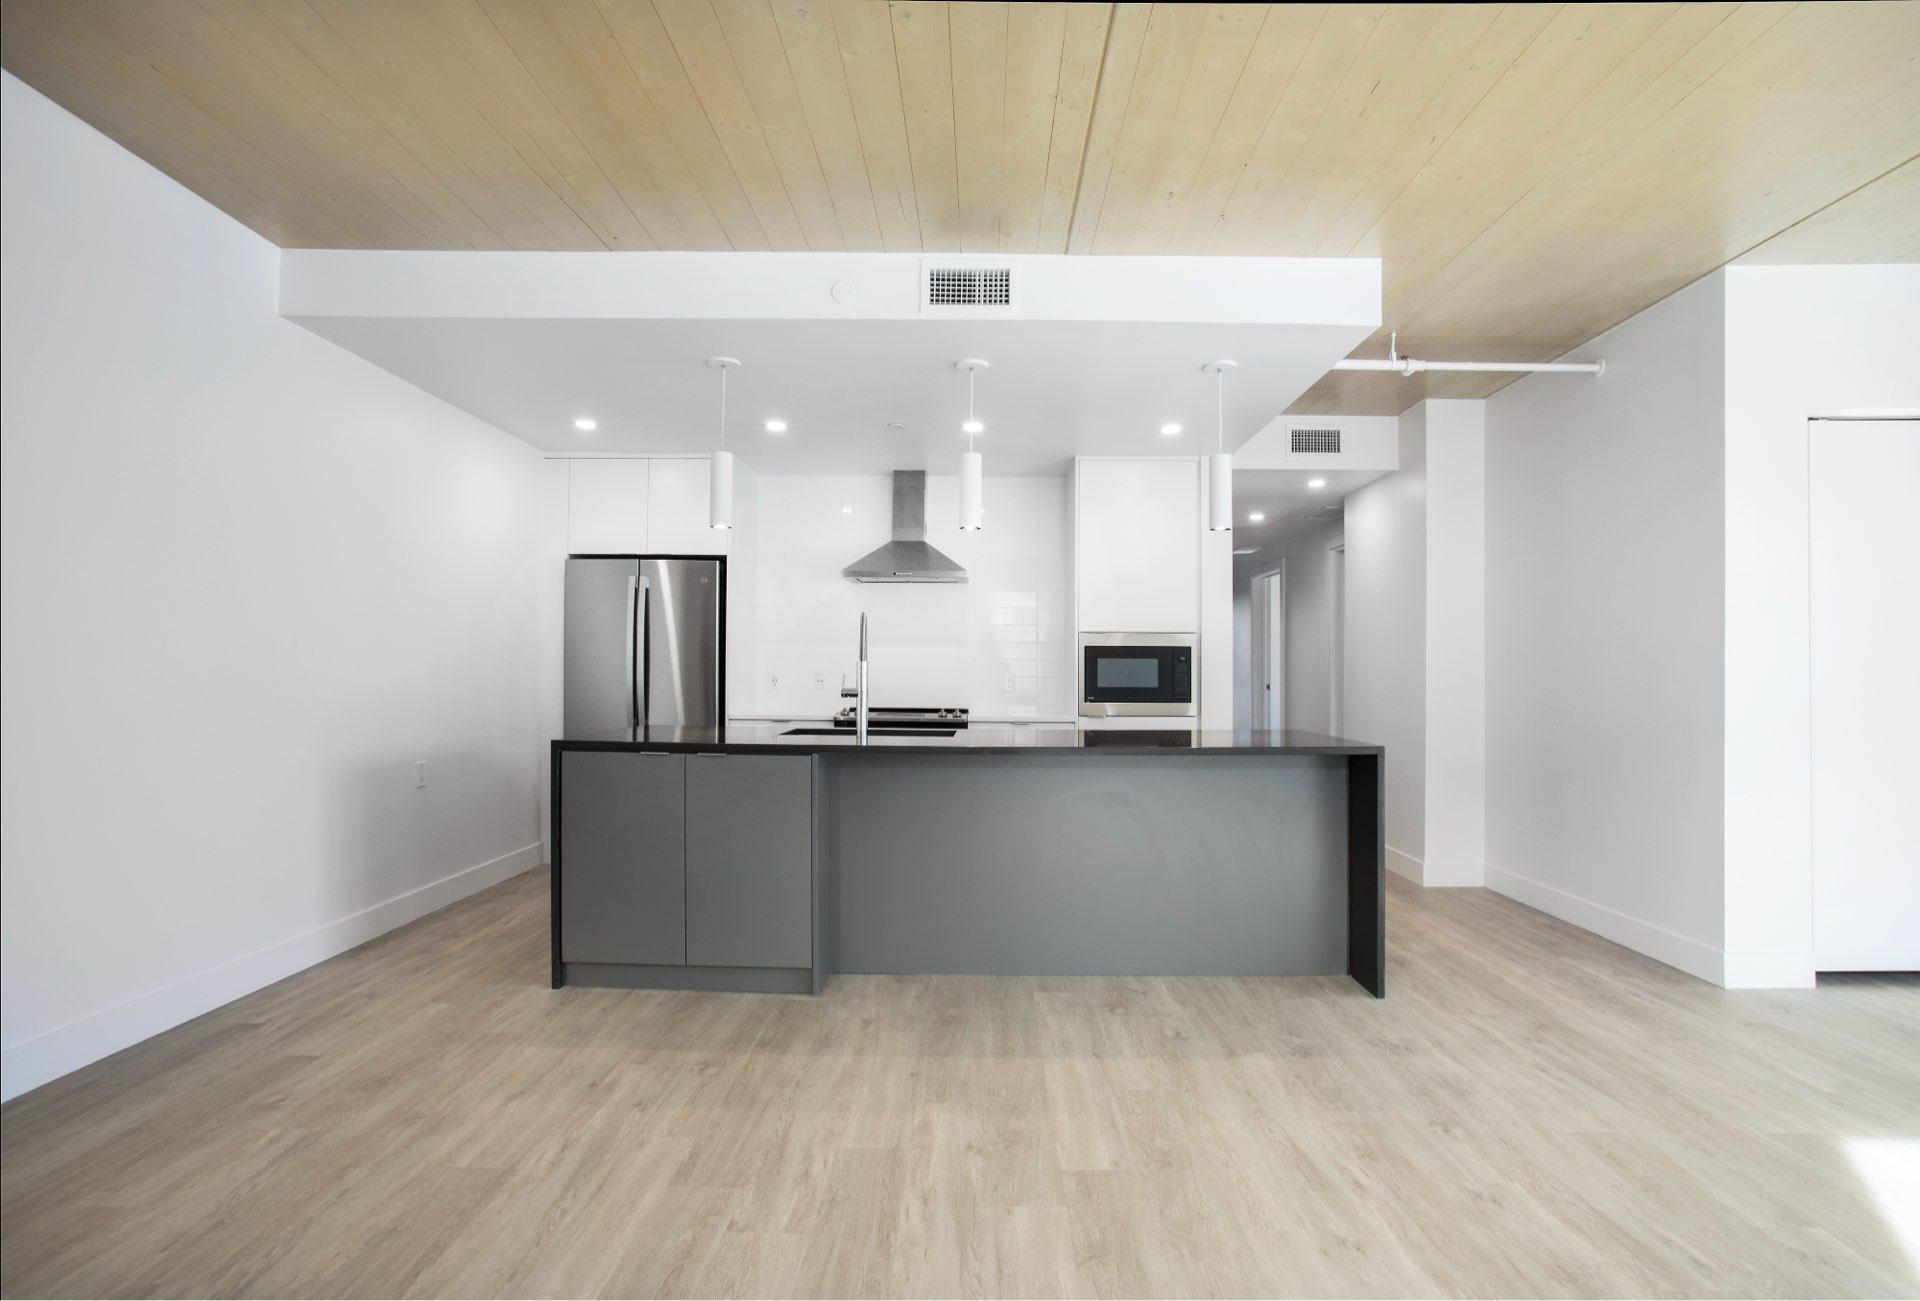 Kitchen, Prospector Residential, architectural design by Elliott Workgroup